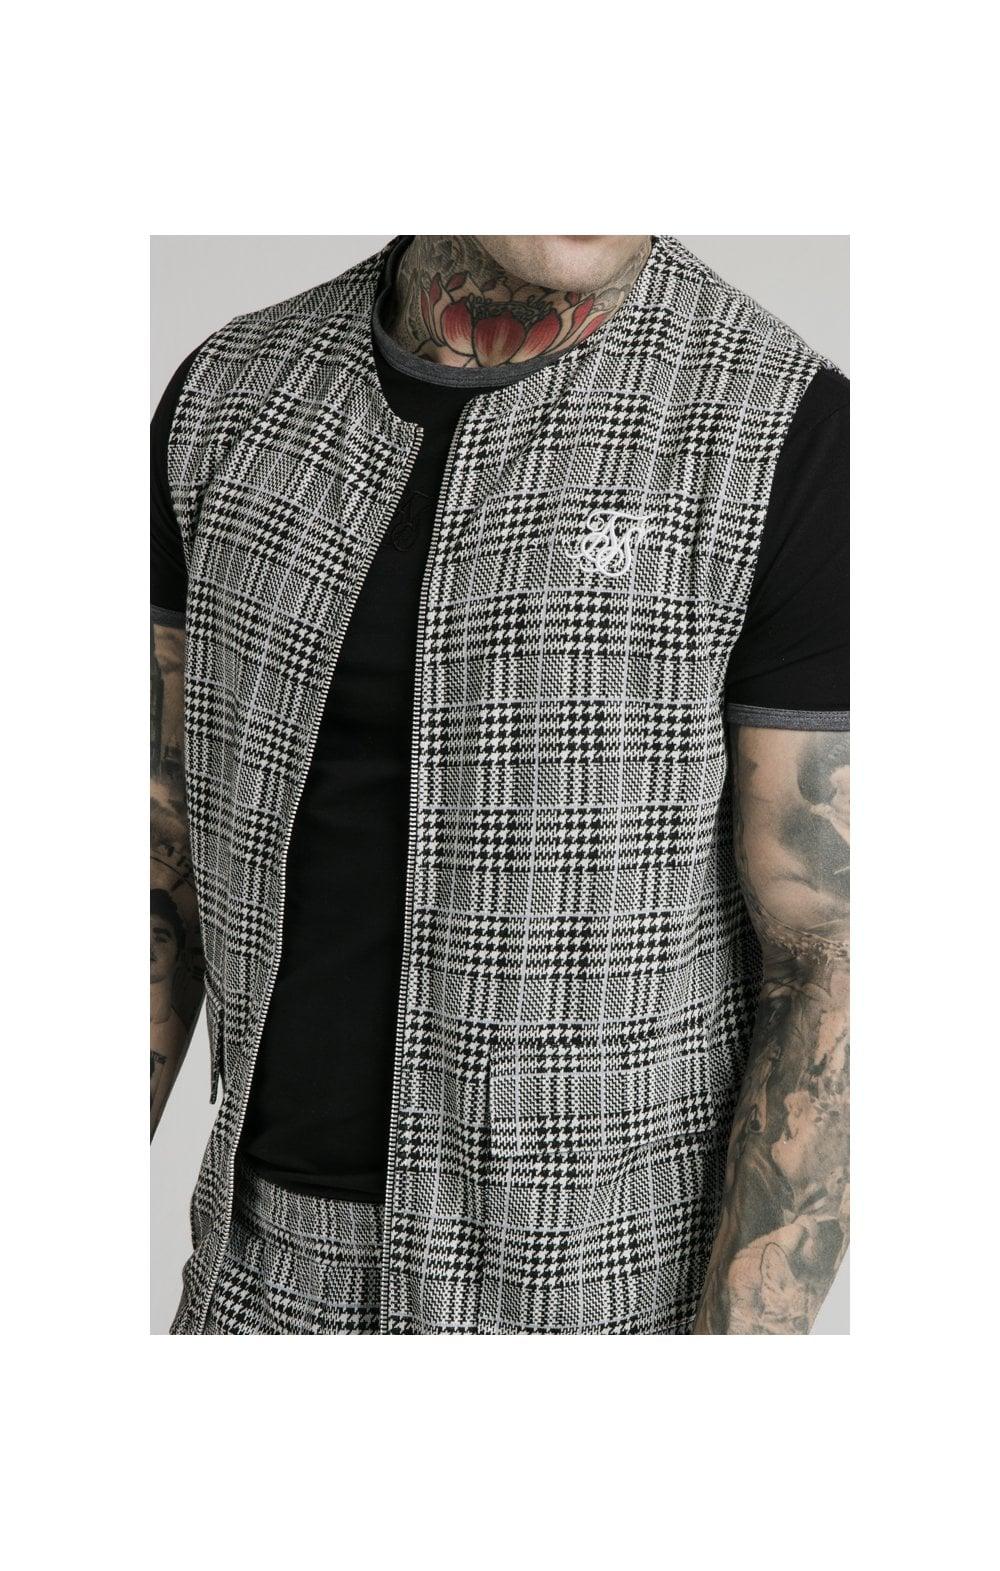 SikSilk Smart Wear Vest - Grey Dogtooth MEN SIZES TOP: Small